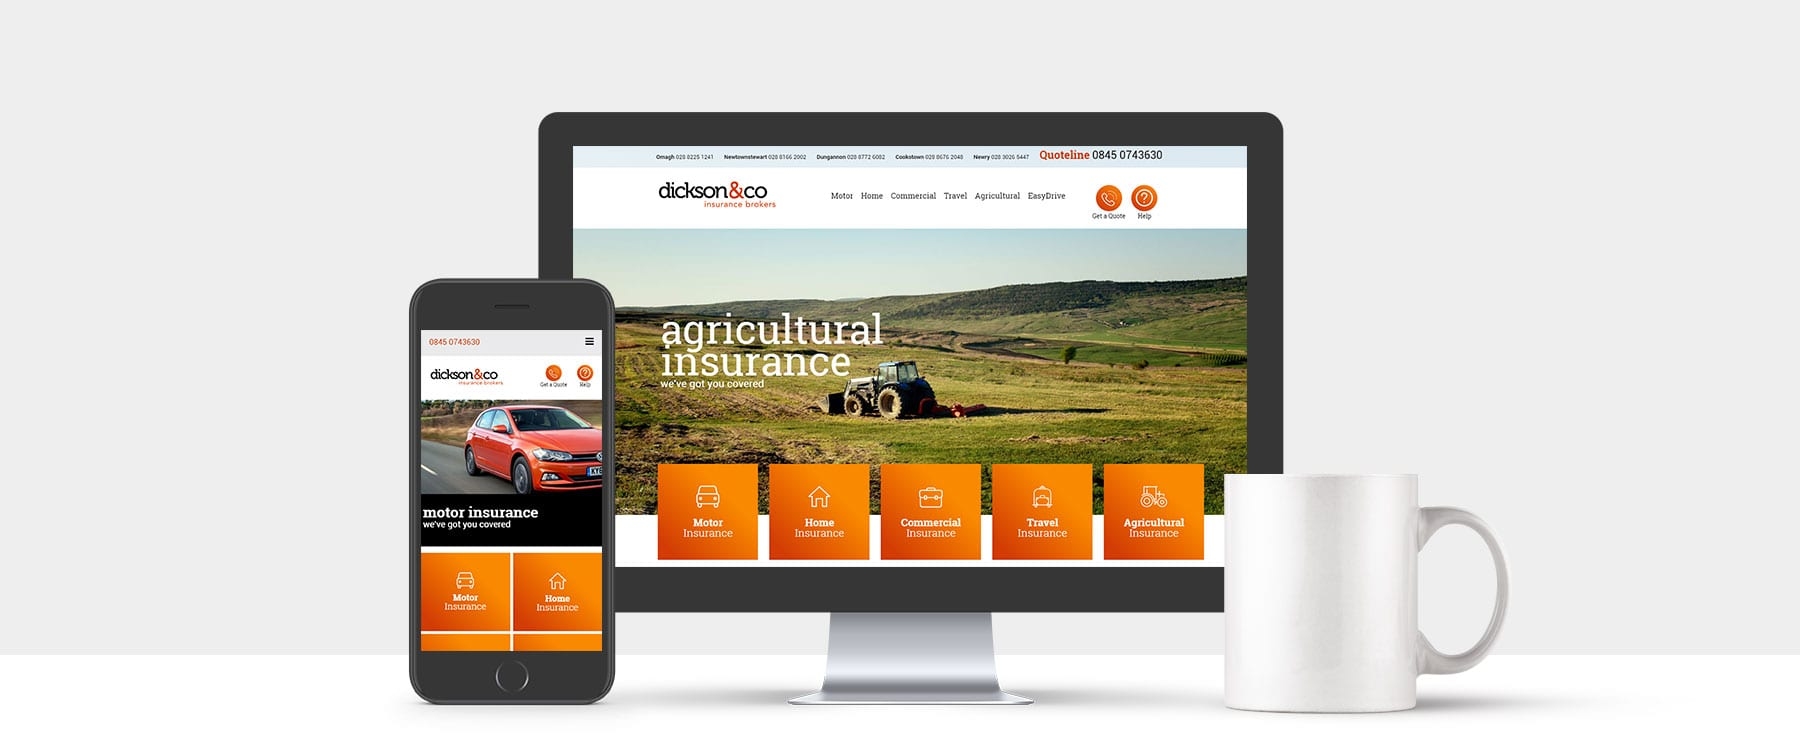 Dickson & Co Insurance Launch Brand New Website Image